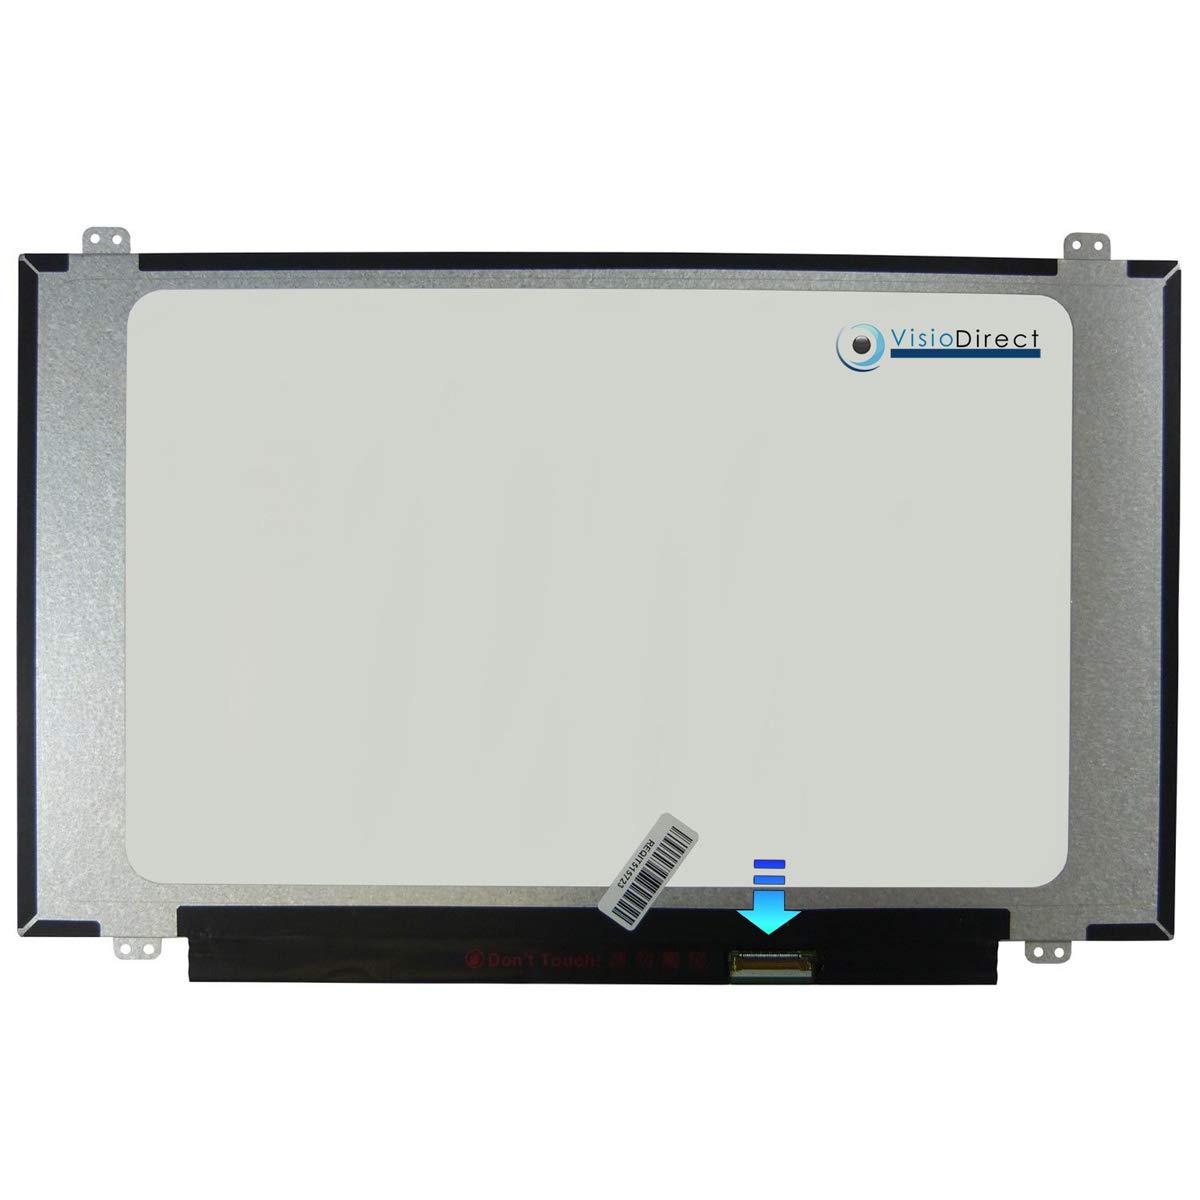 VISIODIRECT Dalle ecran 14LED Type NT140WHM-N44 V8.0 pour BOE BOEHYDIS 1366 x 768 30pin 315mm